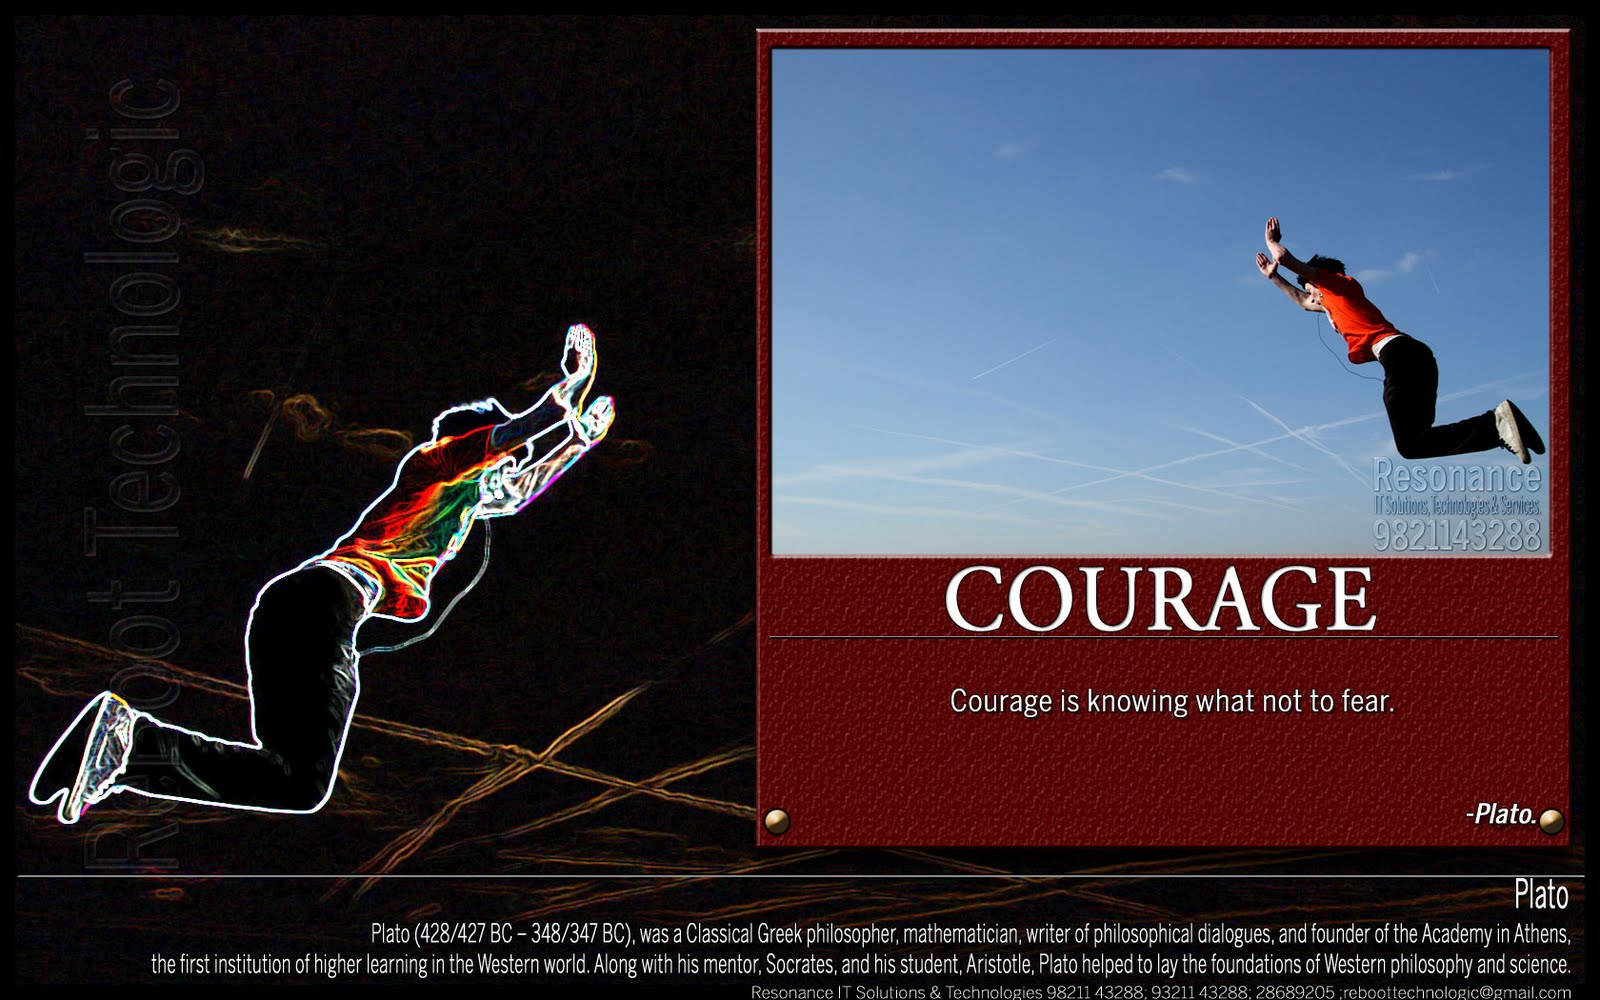 http://3.bp.blogspot.com/_WEbwceD8uAI/TQ9CFZKUpGI/AAAAAAAABFo/z4DFUvwpUOA/s1600/Quotes%2BOn%2BDesk-Courage2.jpg